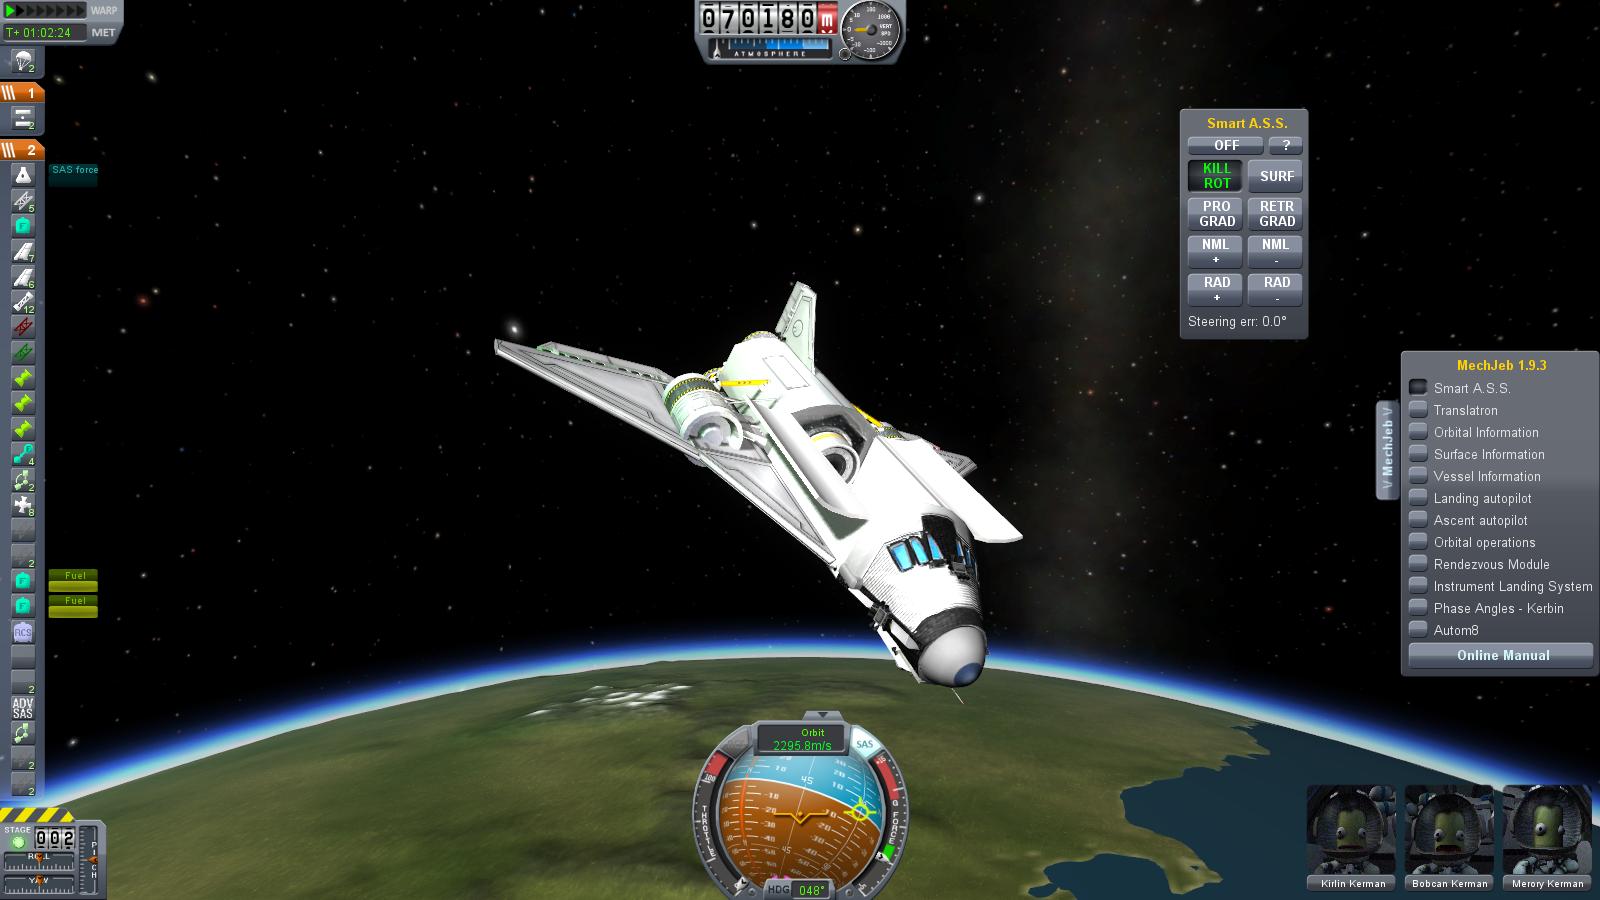 kerbal space program interplanetary ship - photo #43